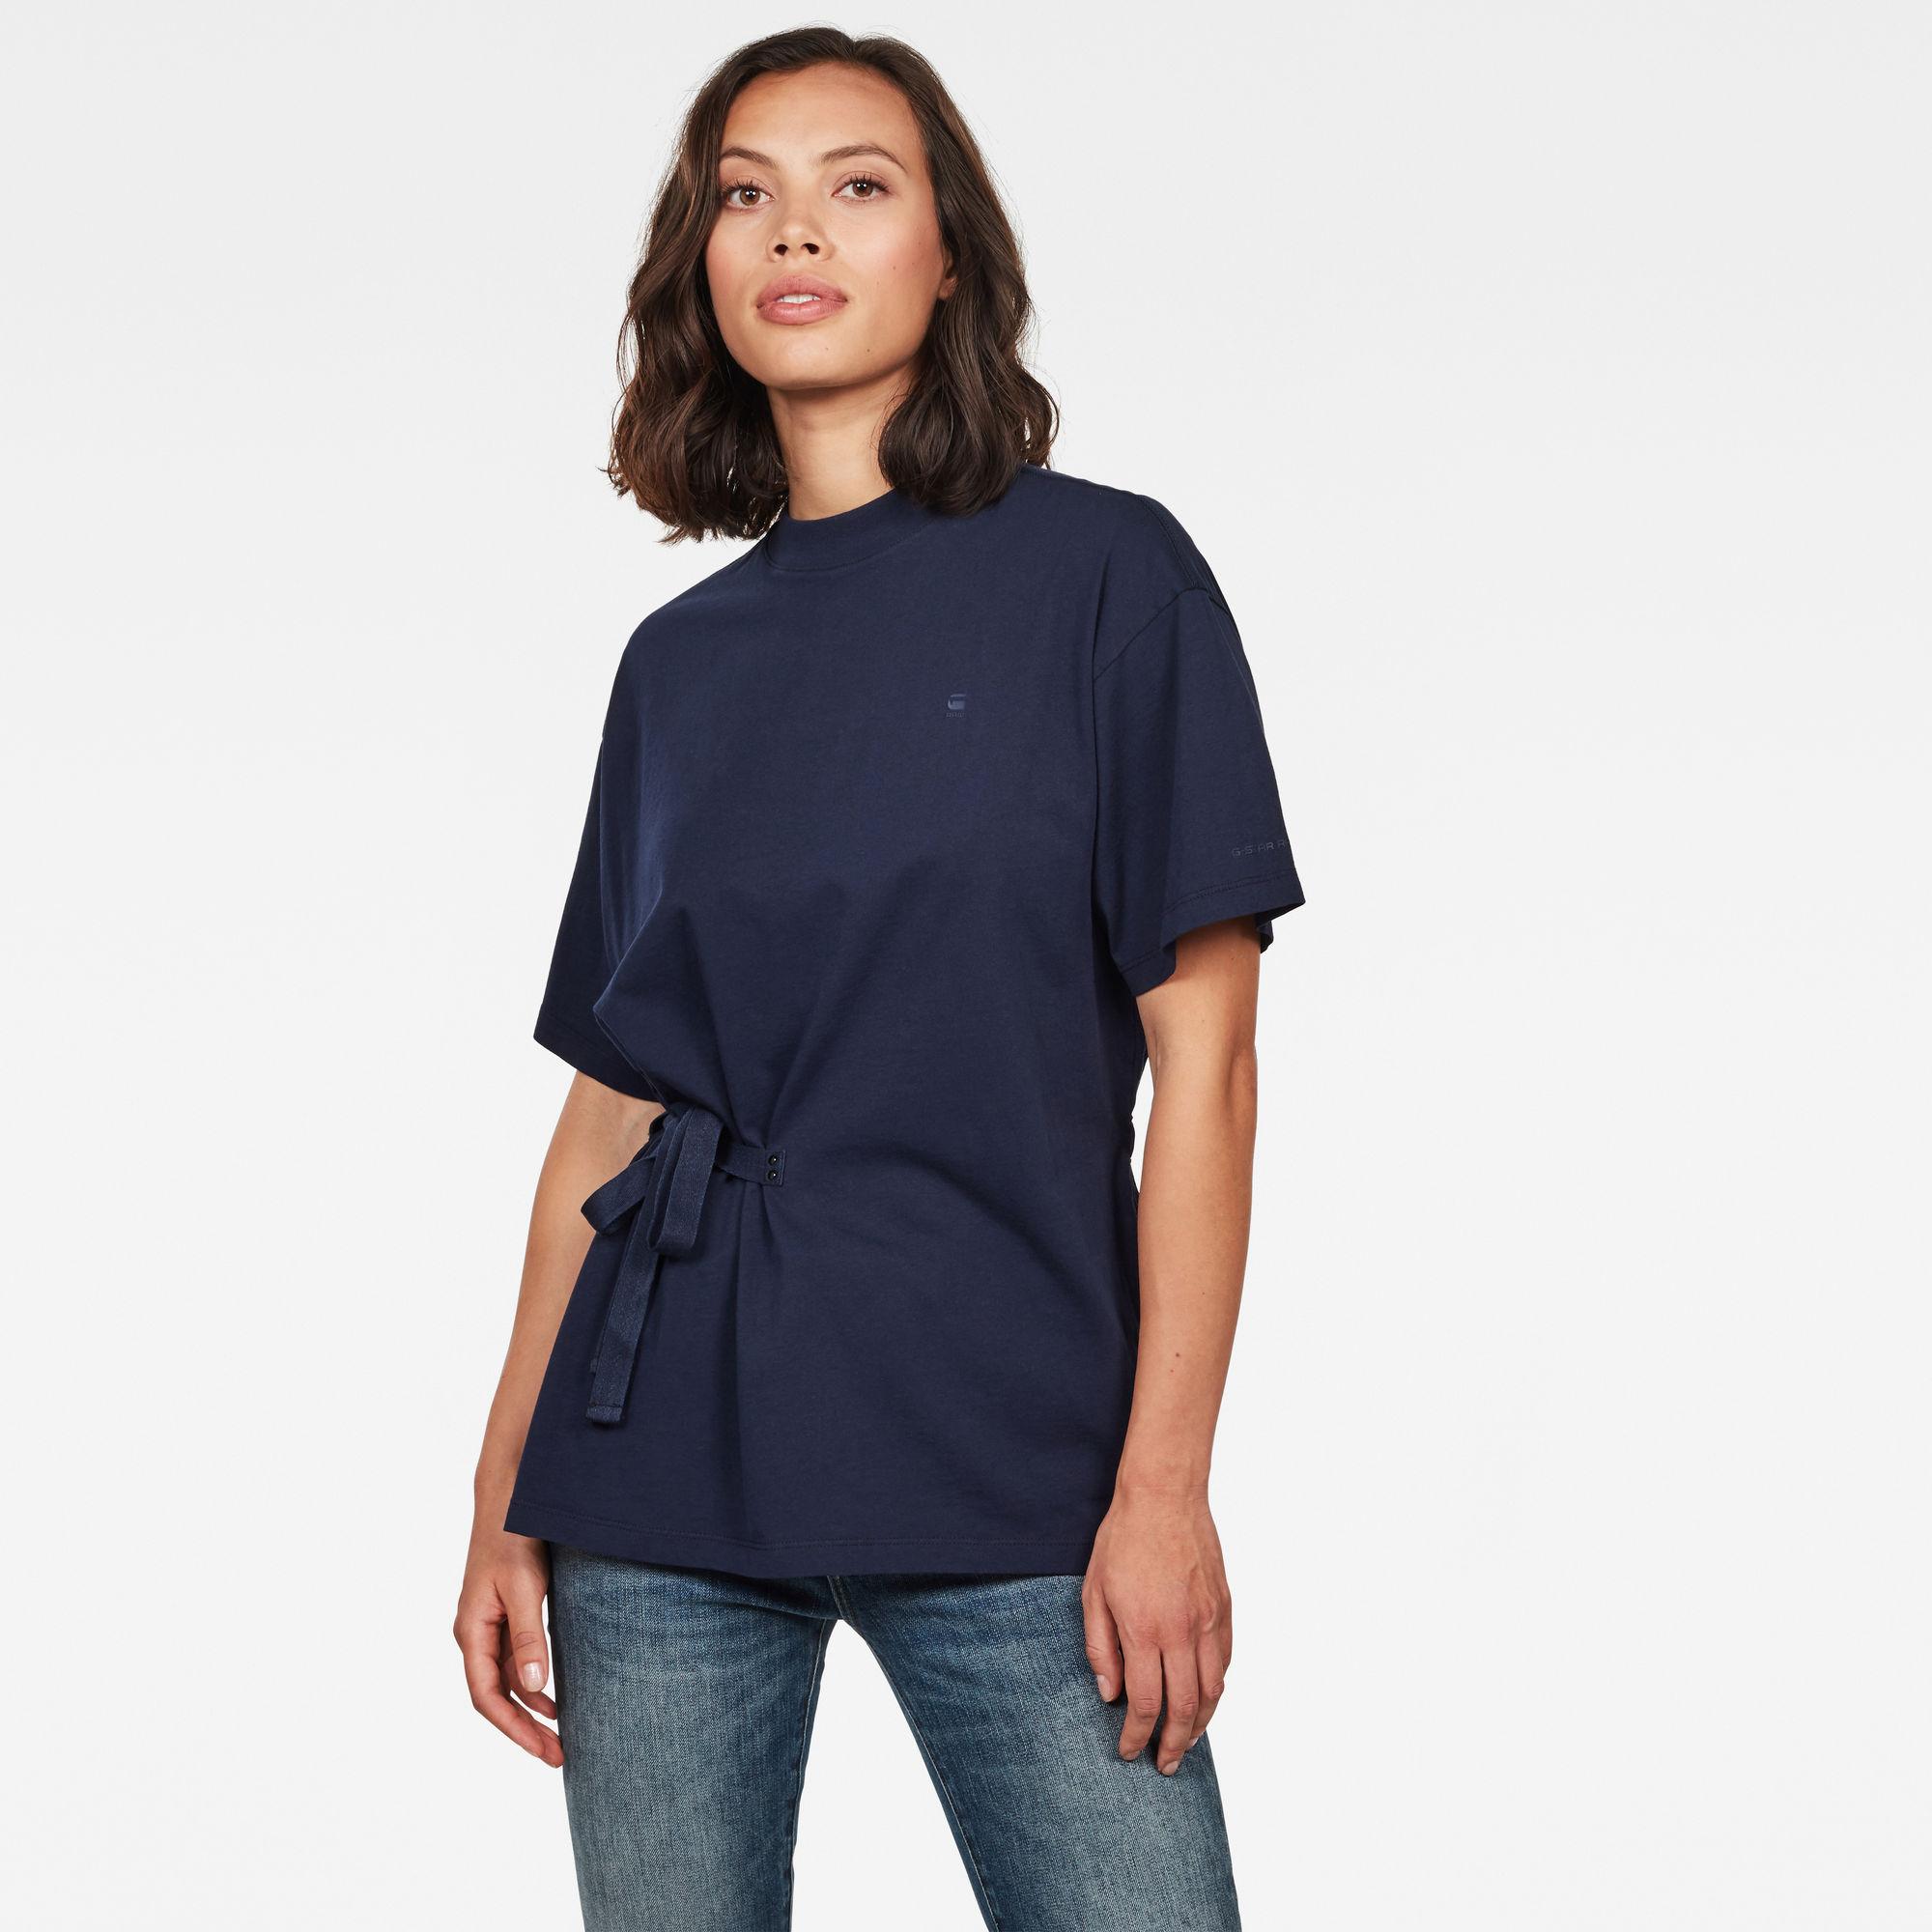 g star camisetas mujer 2